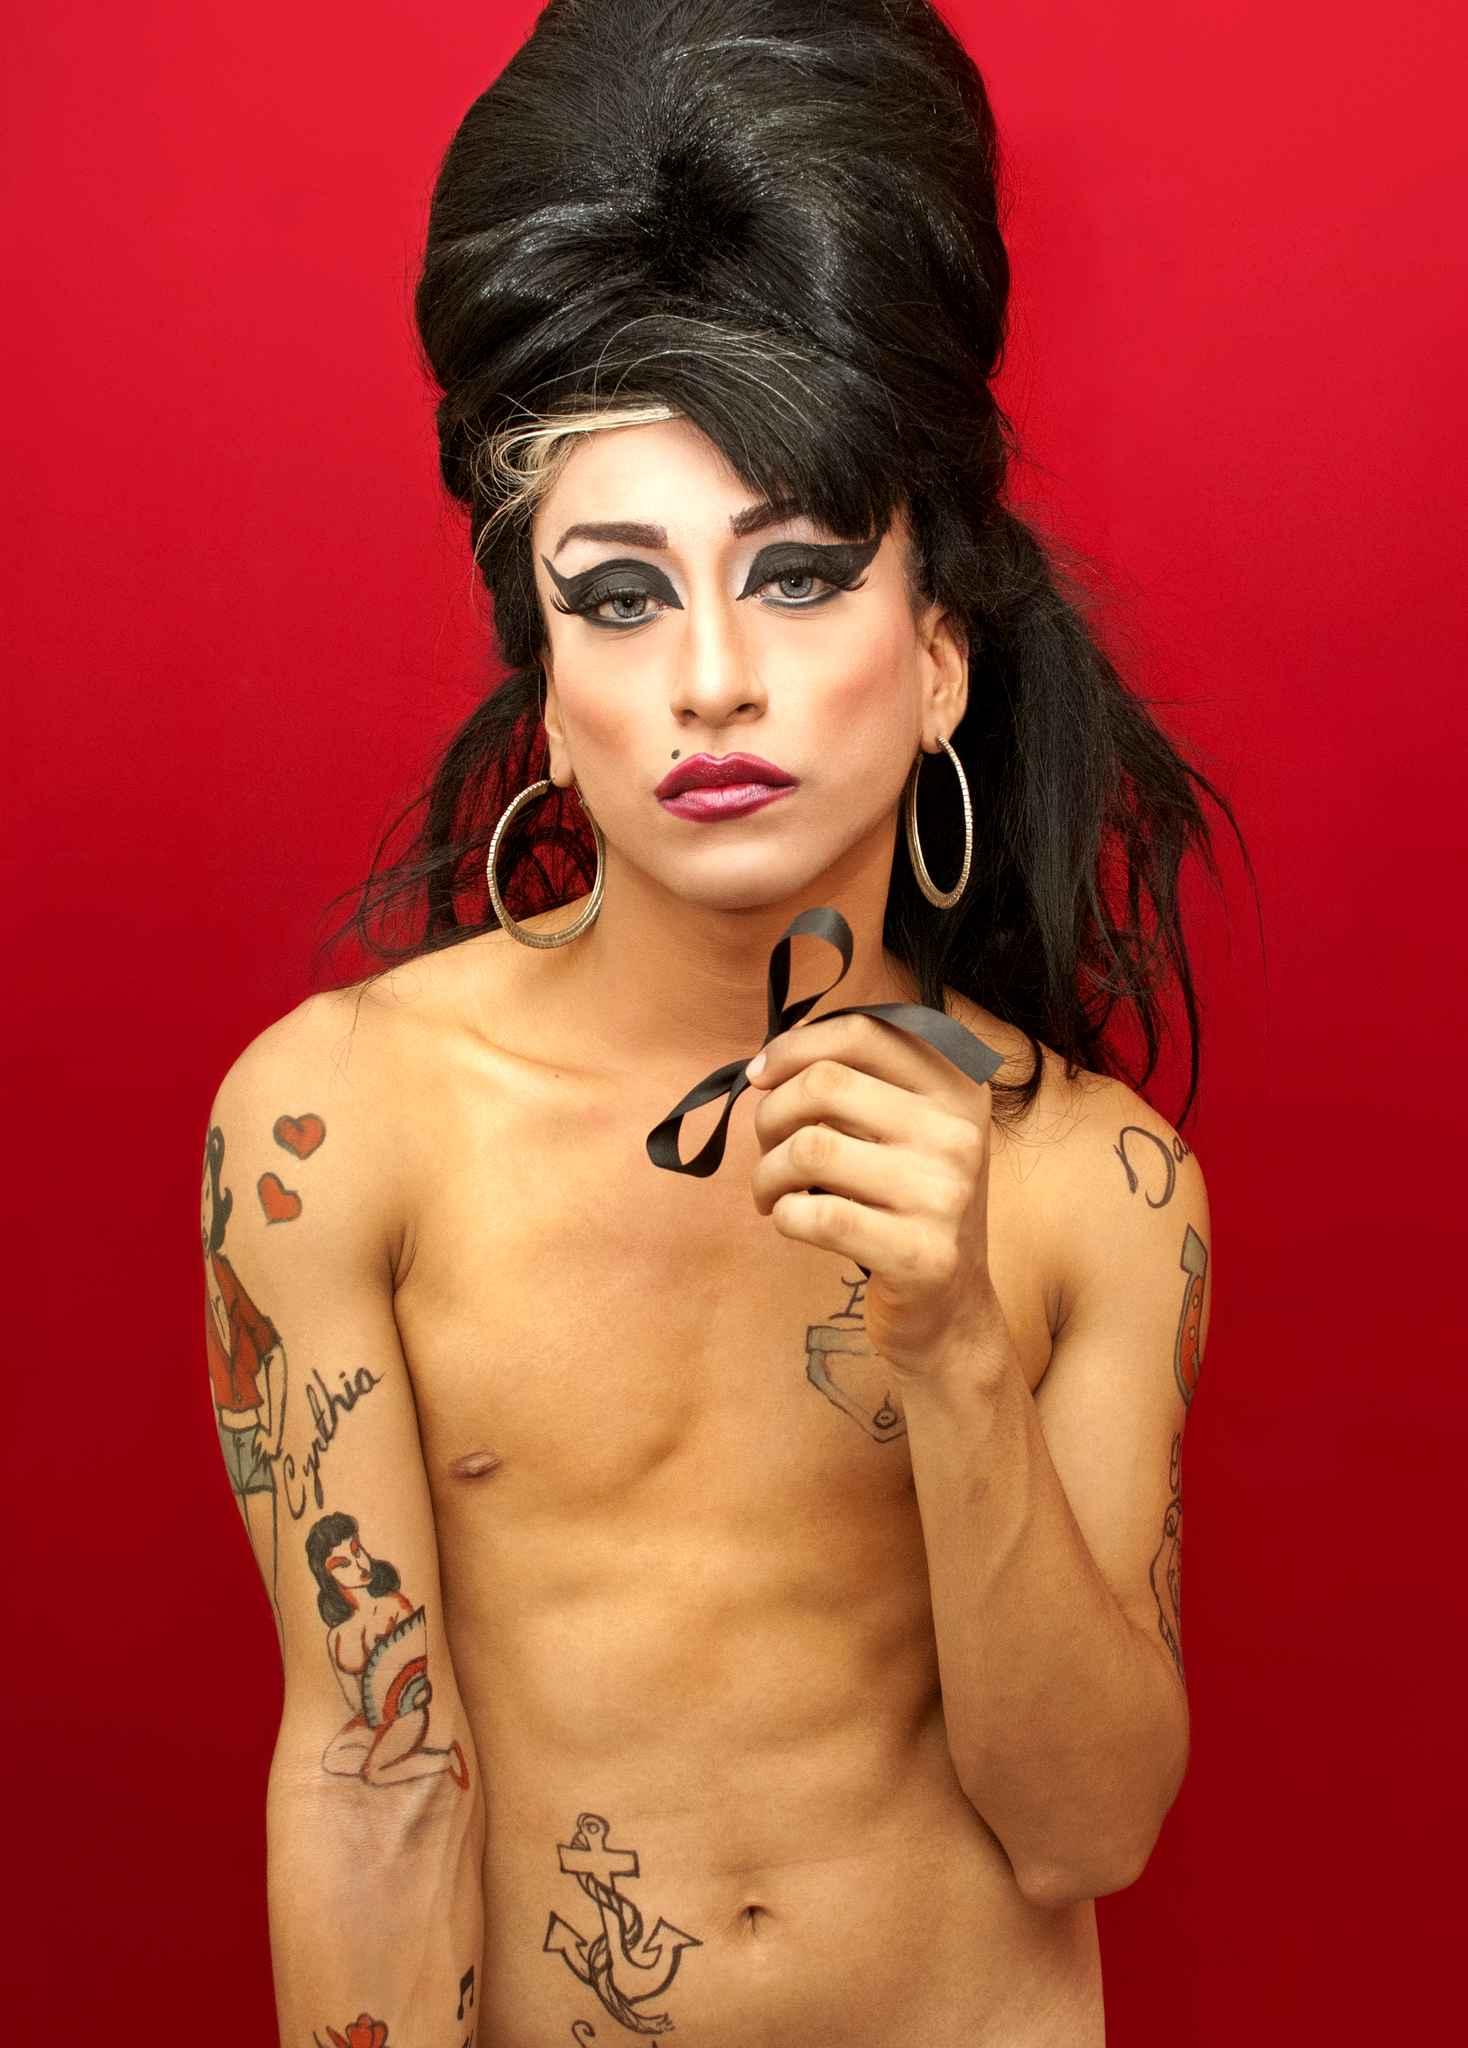 Luis Arturo Aguirre - travesti - vivre trans